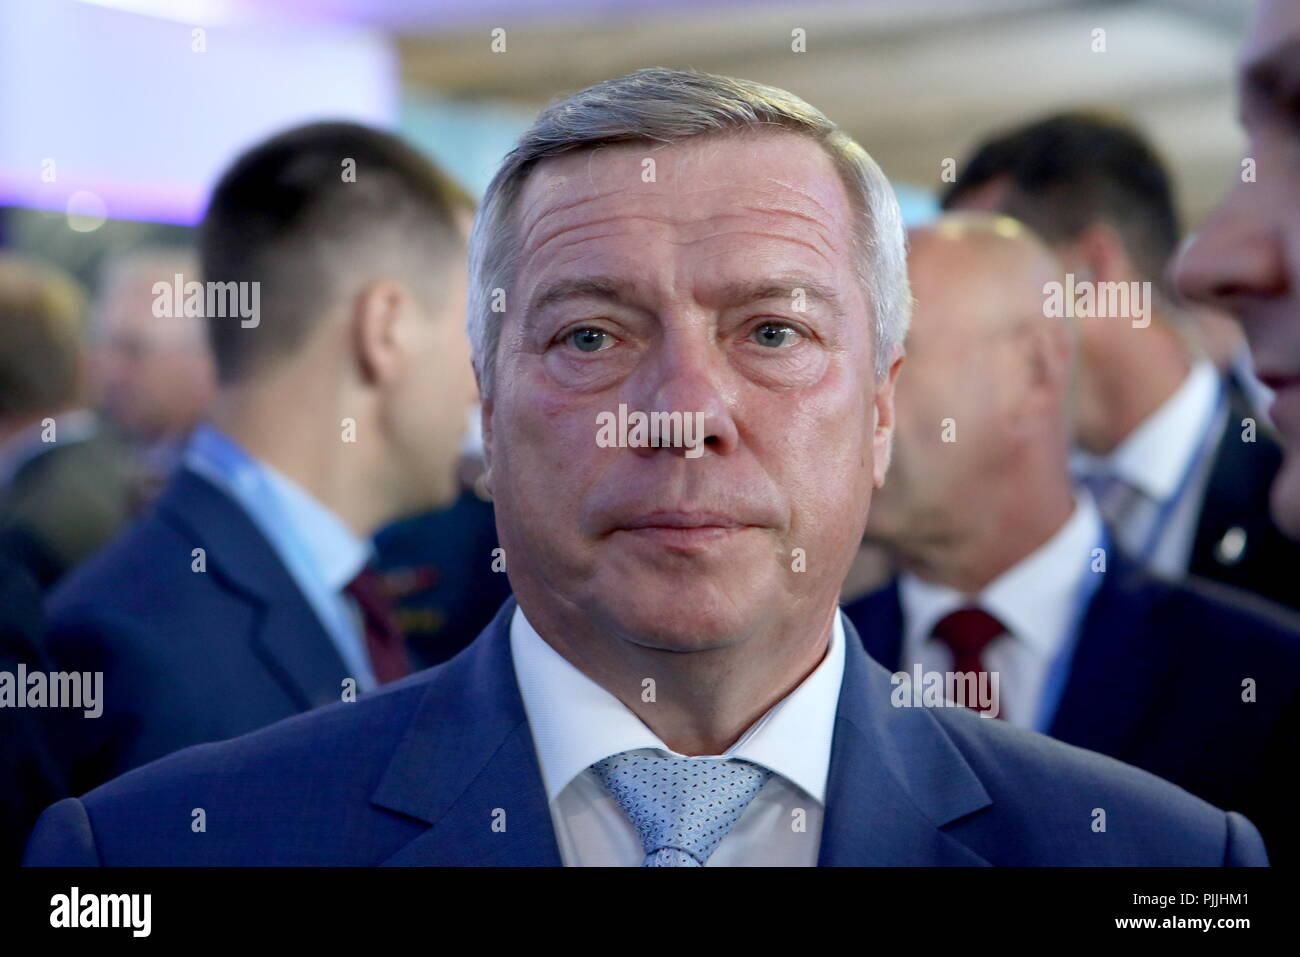 Vasily Golubev - politician today